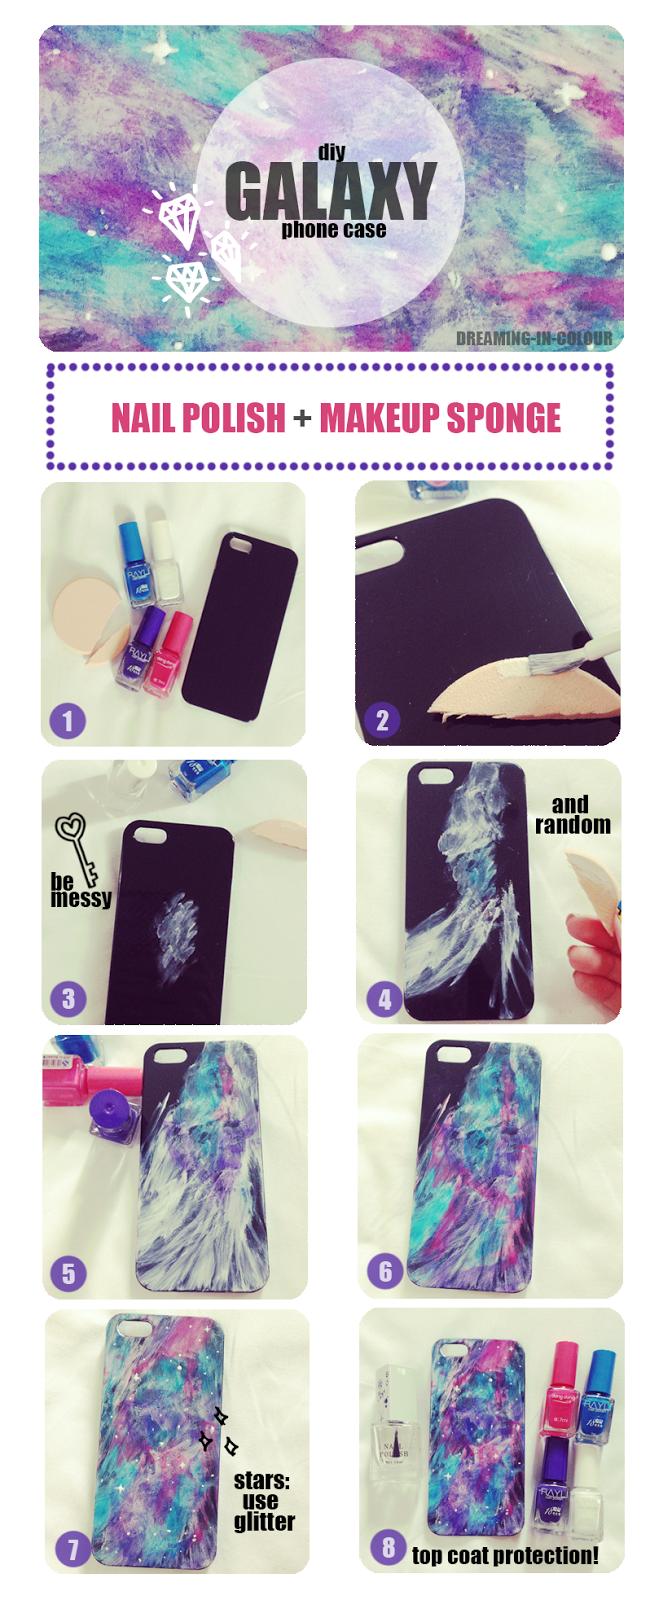 diy.fashion.nails.life.: diy: aurora galaxy phone case   tats ...